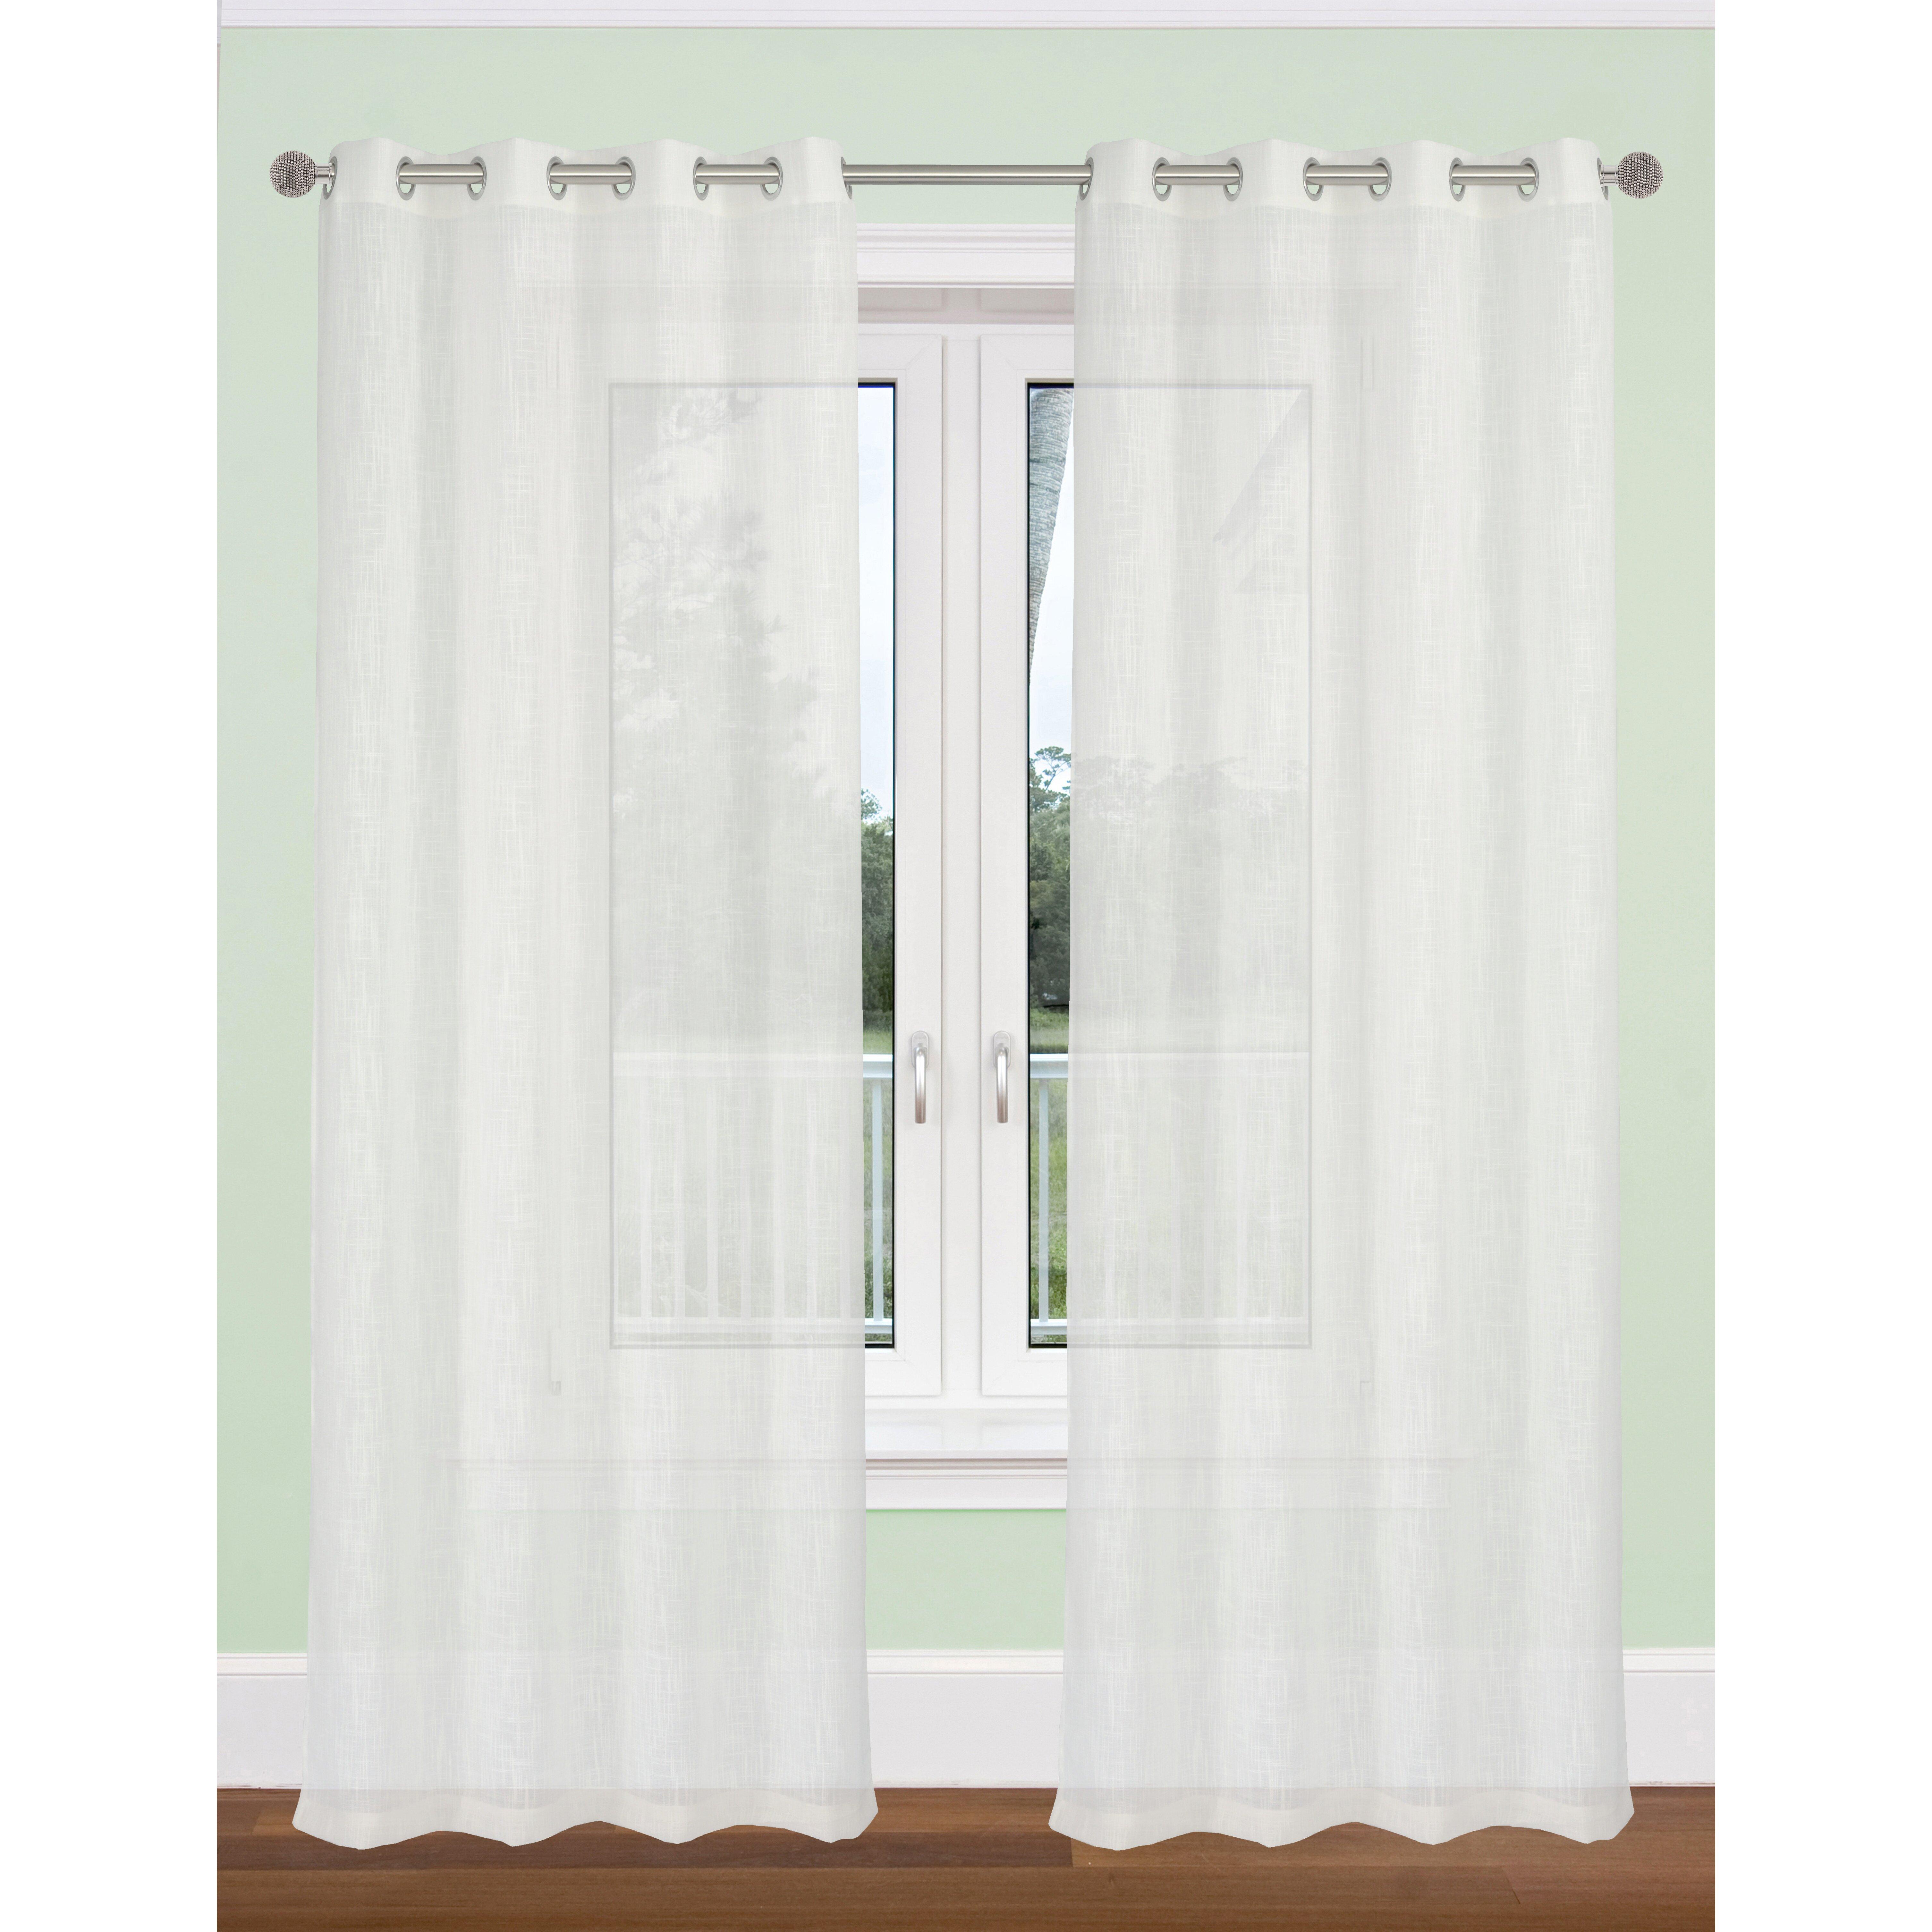 Textured Sheer Curtain Panels Smocked Sheer Curtain Panels